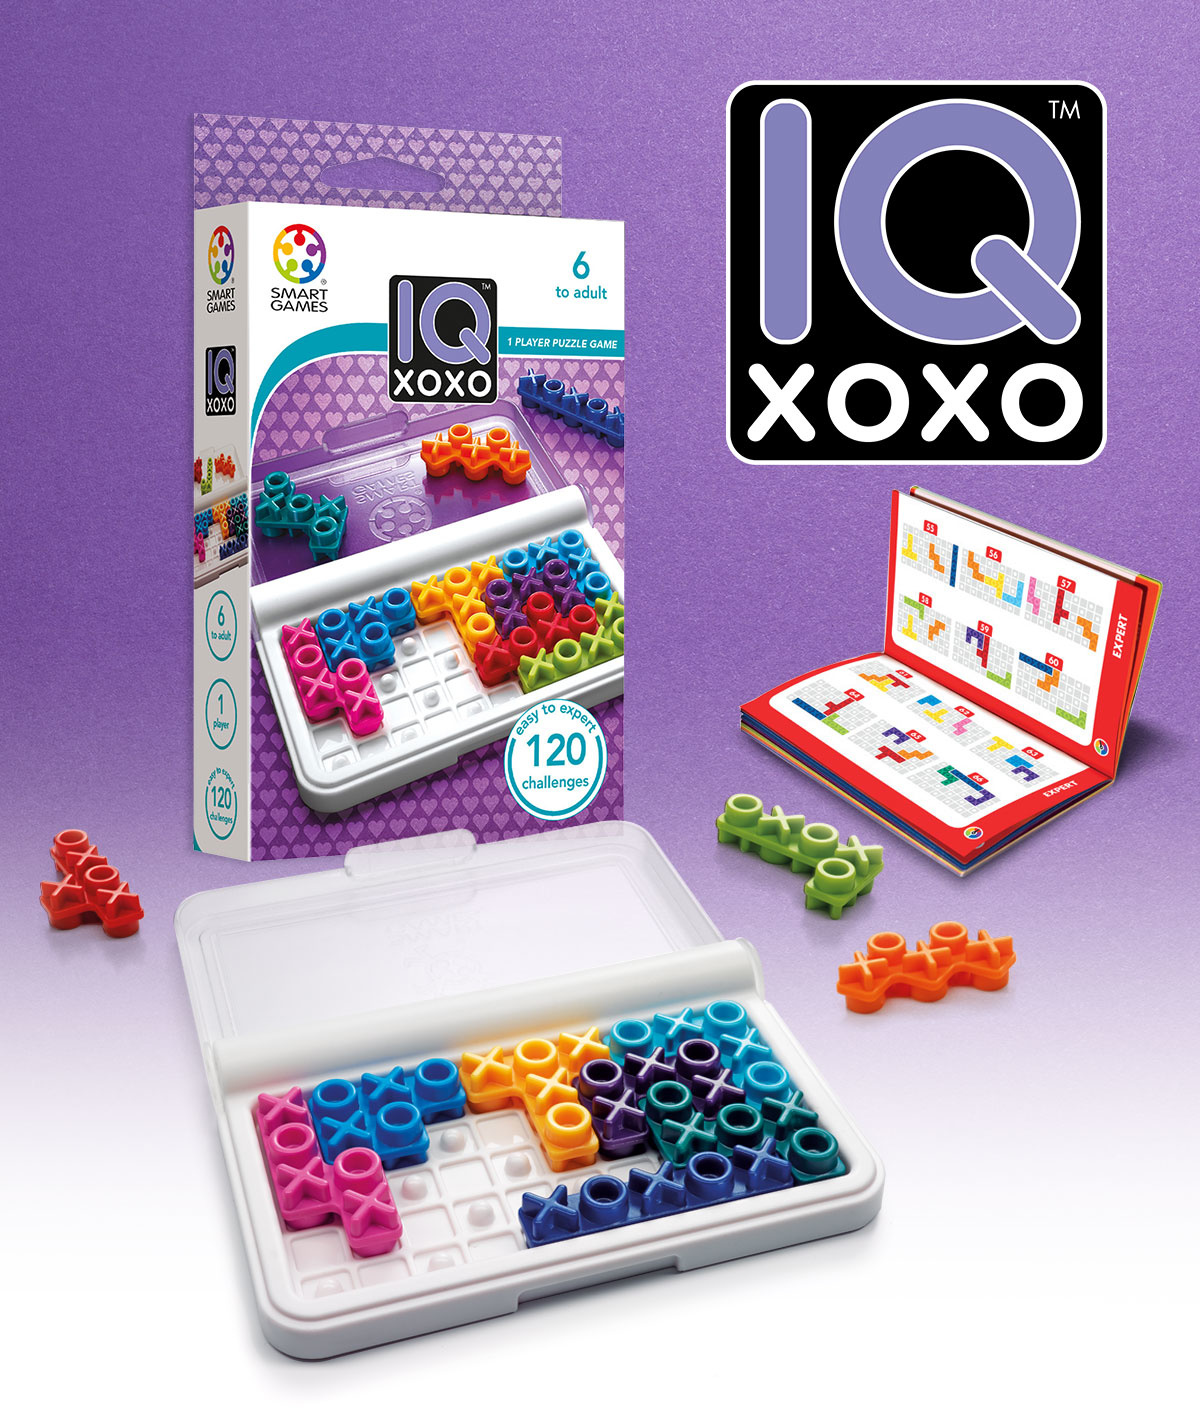 Game/IQ XOXO-2